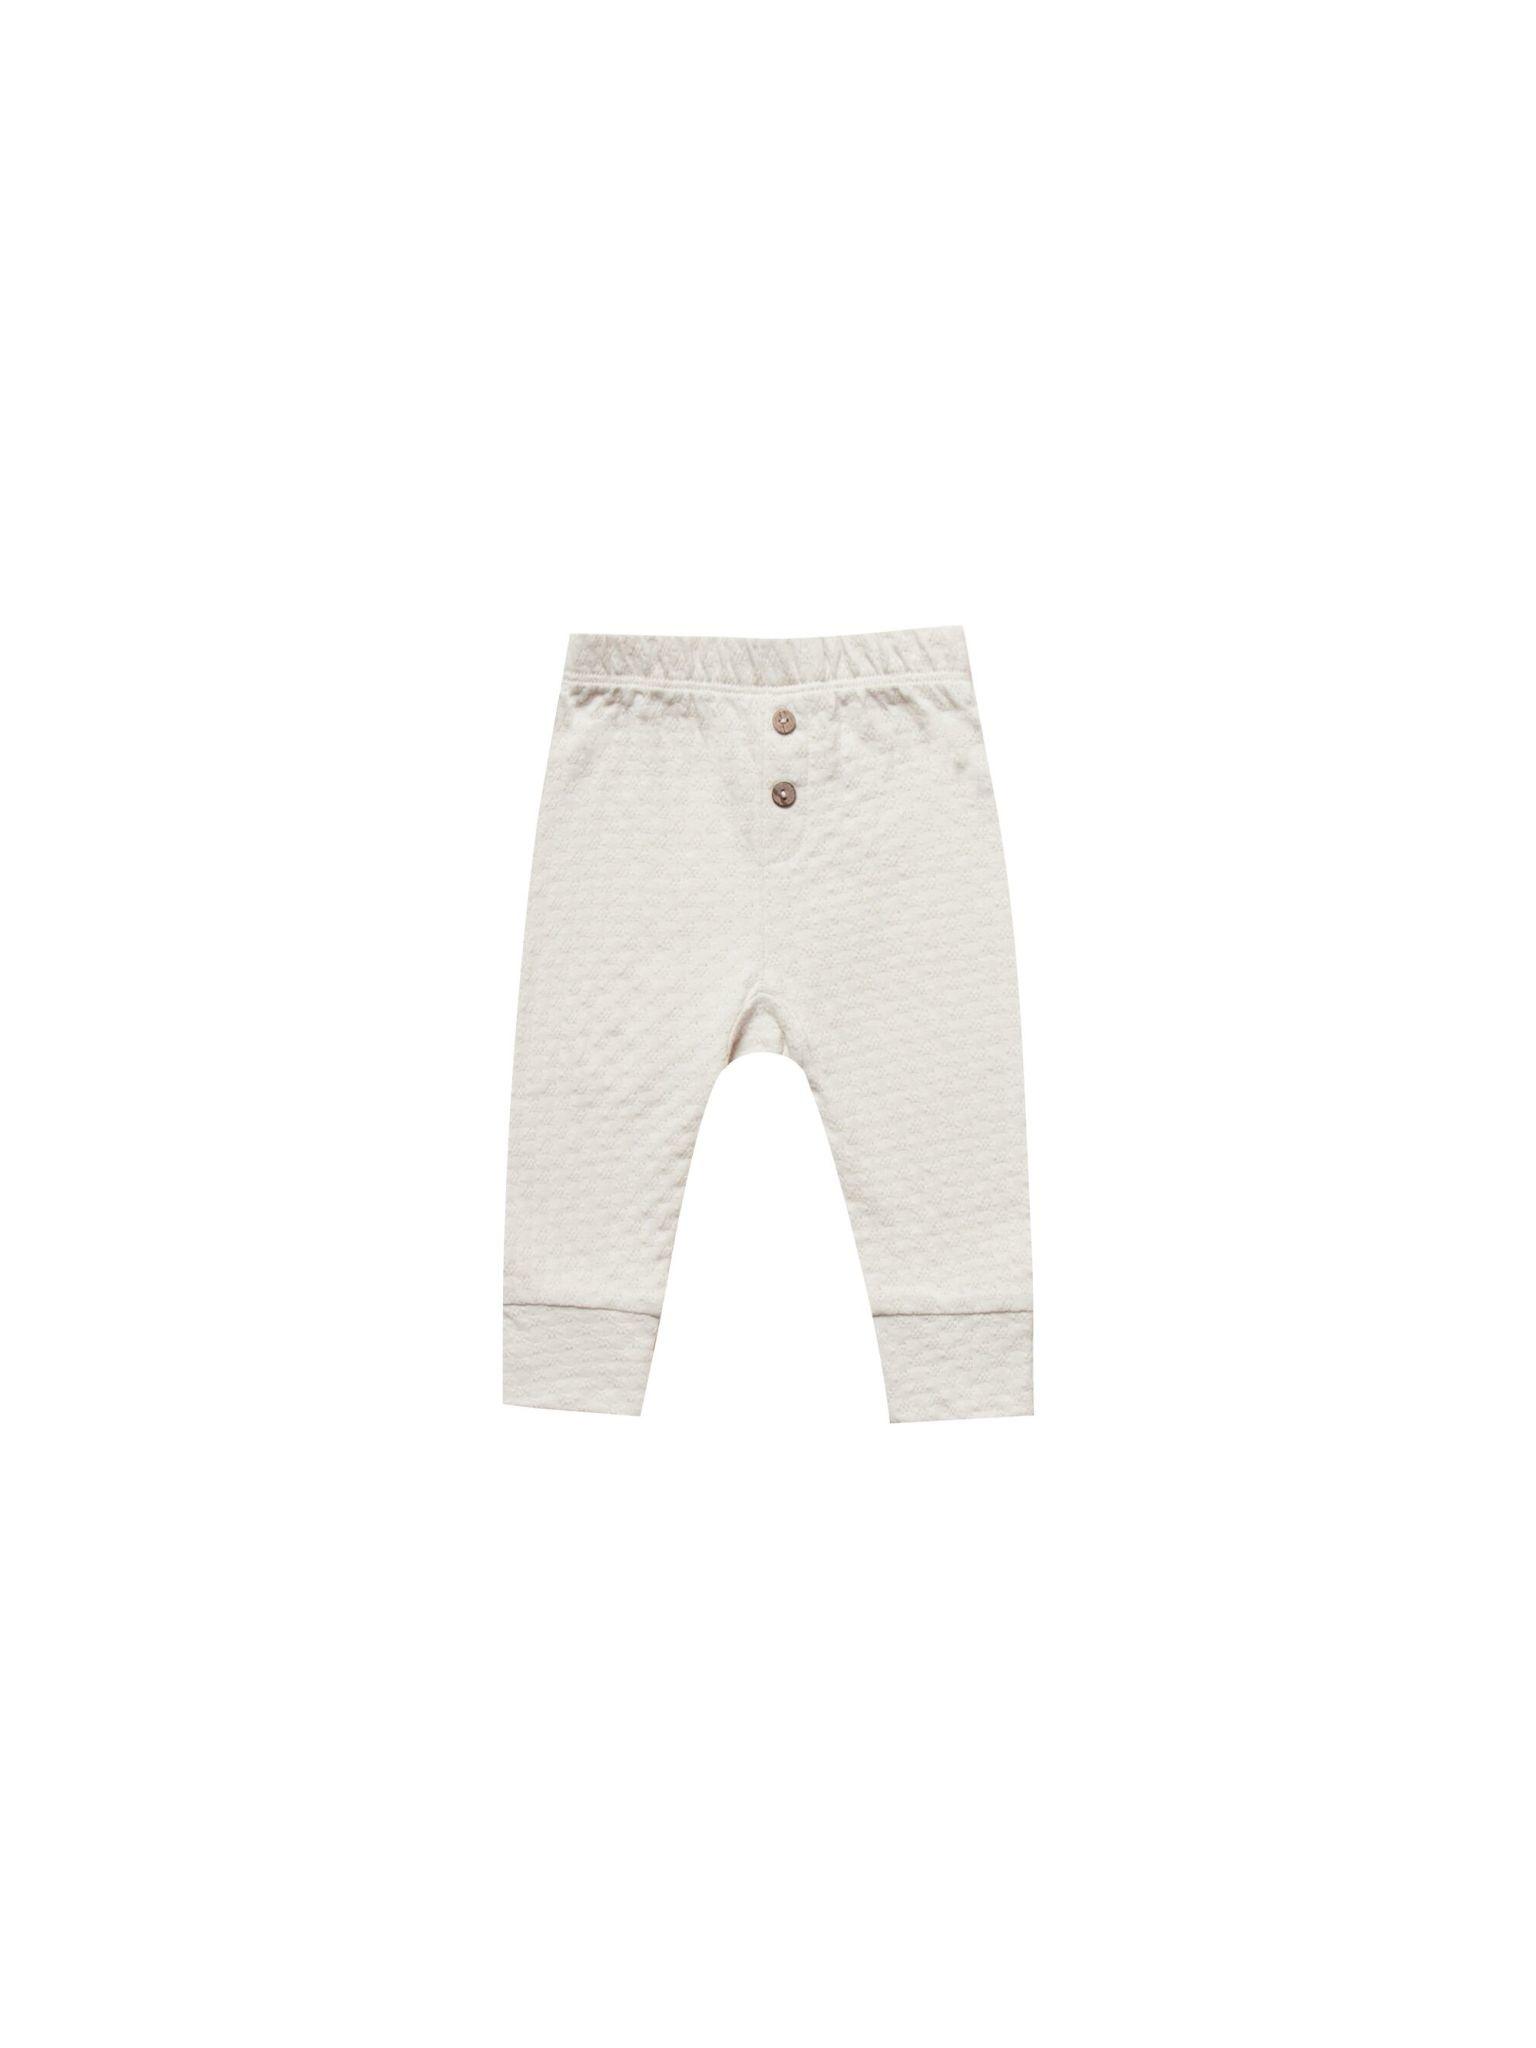 QUINCY MAE Pointelle Pajama Pant